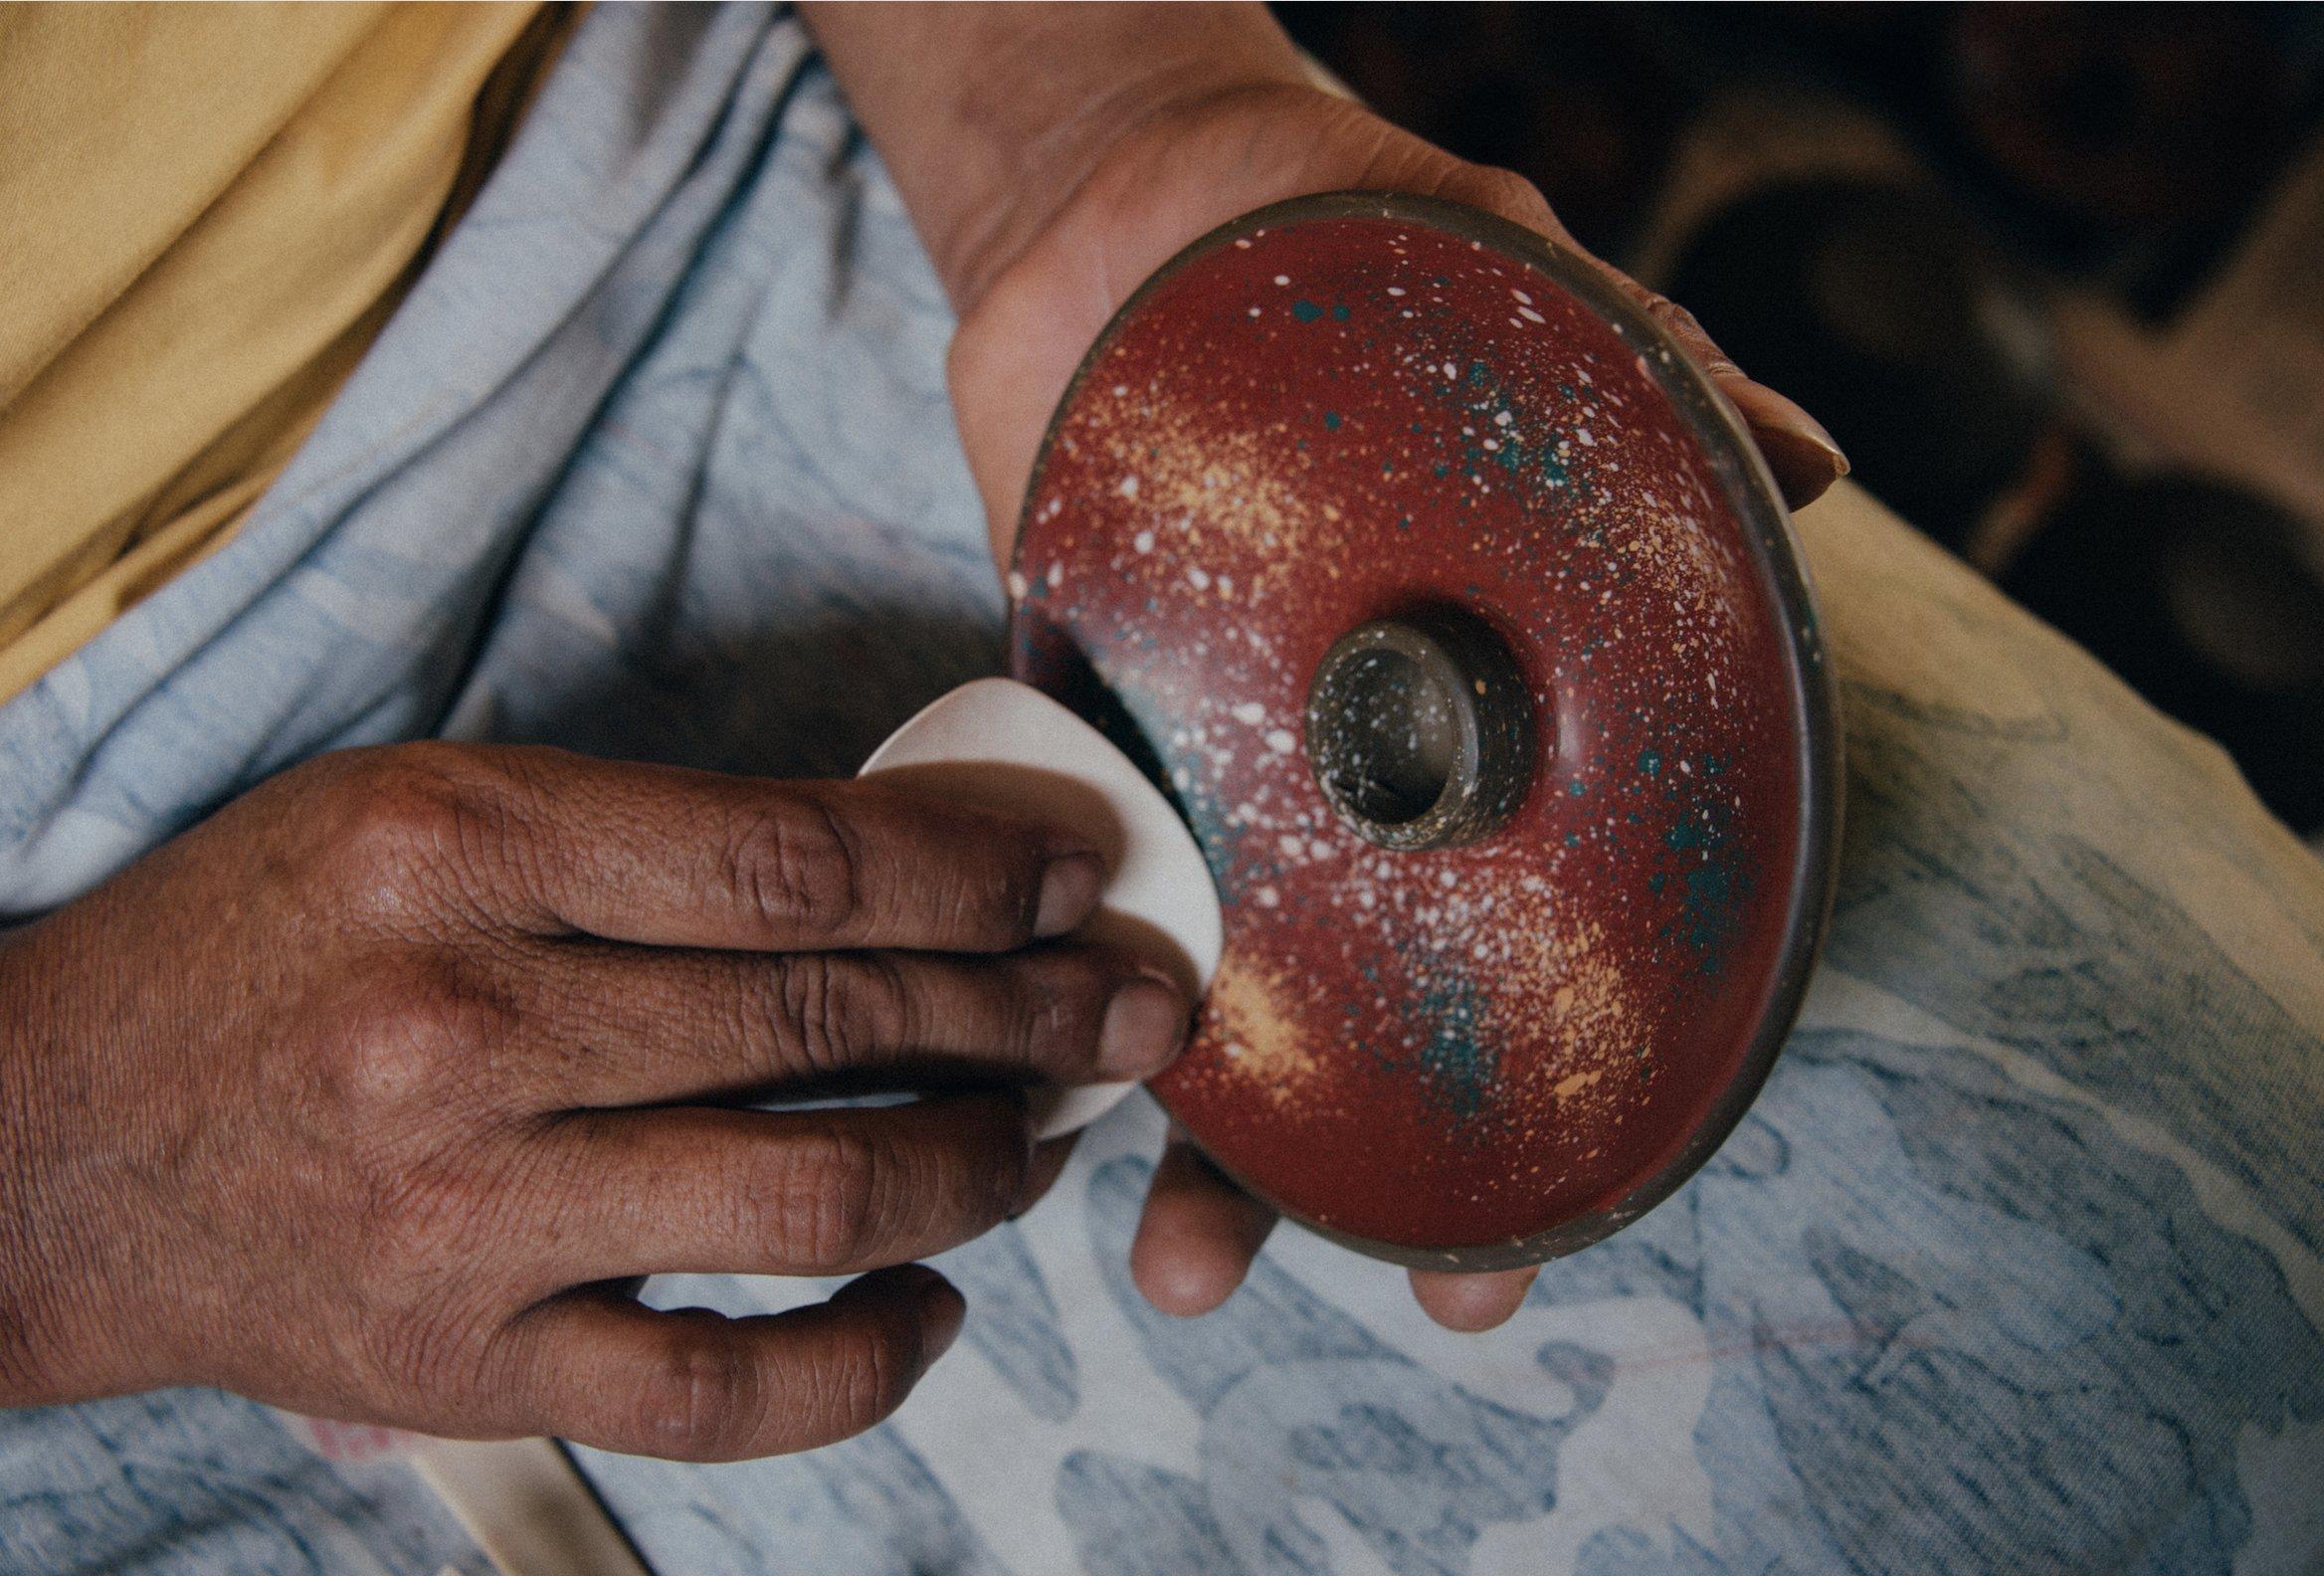 Luna Sundara Palo Santo Holder Authentic Chulucanas Peru Pottery (Green) 5 Palo Santo Sticks Included by Luna Sundara (Image #6)